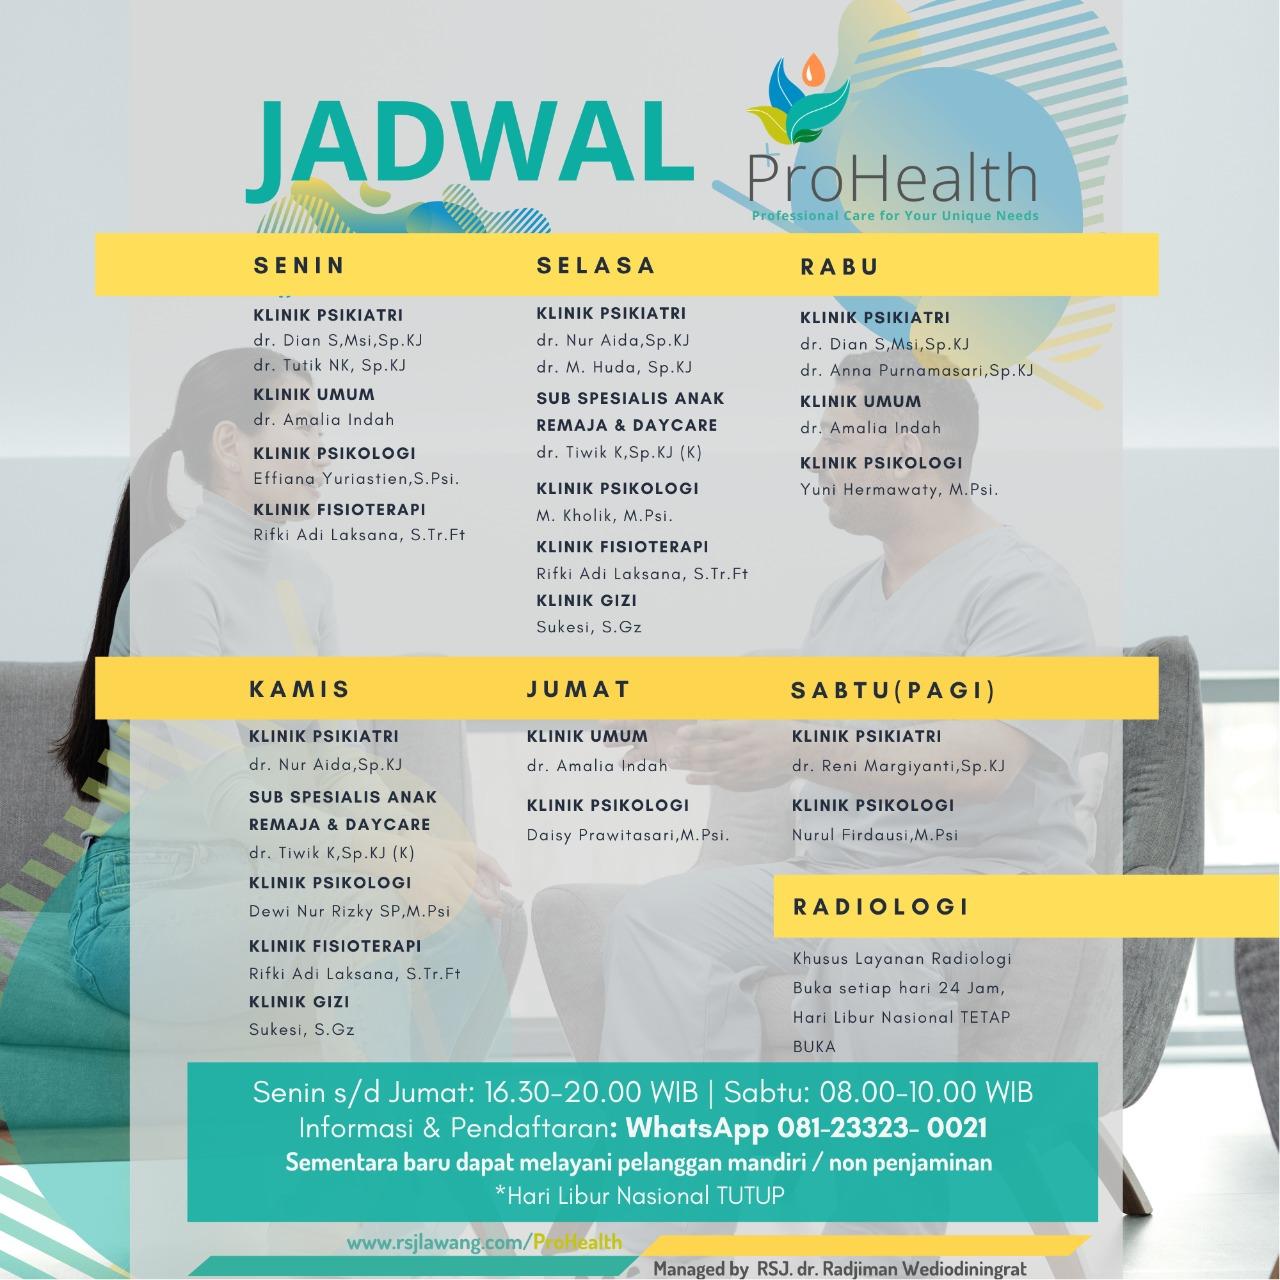 Jadwal Pelayanan Pro Health